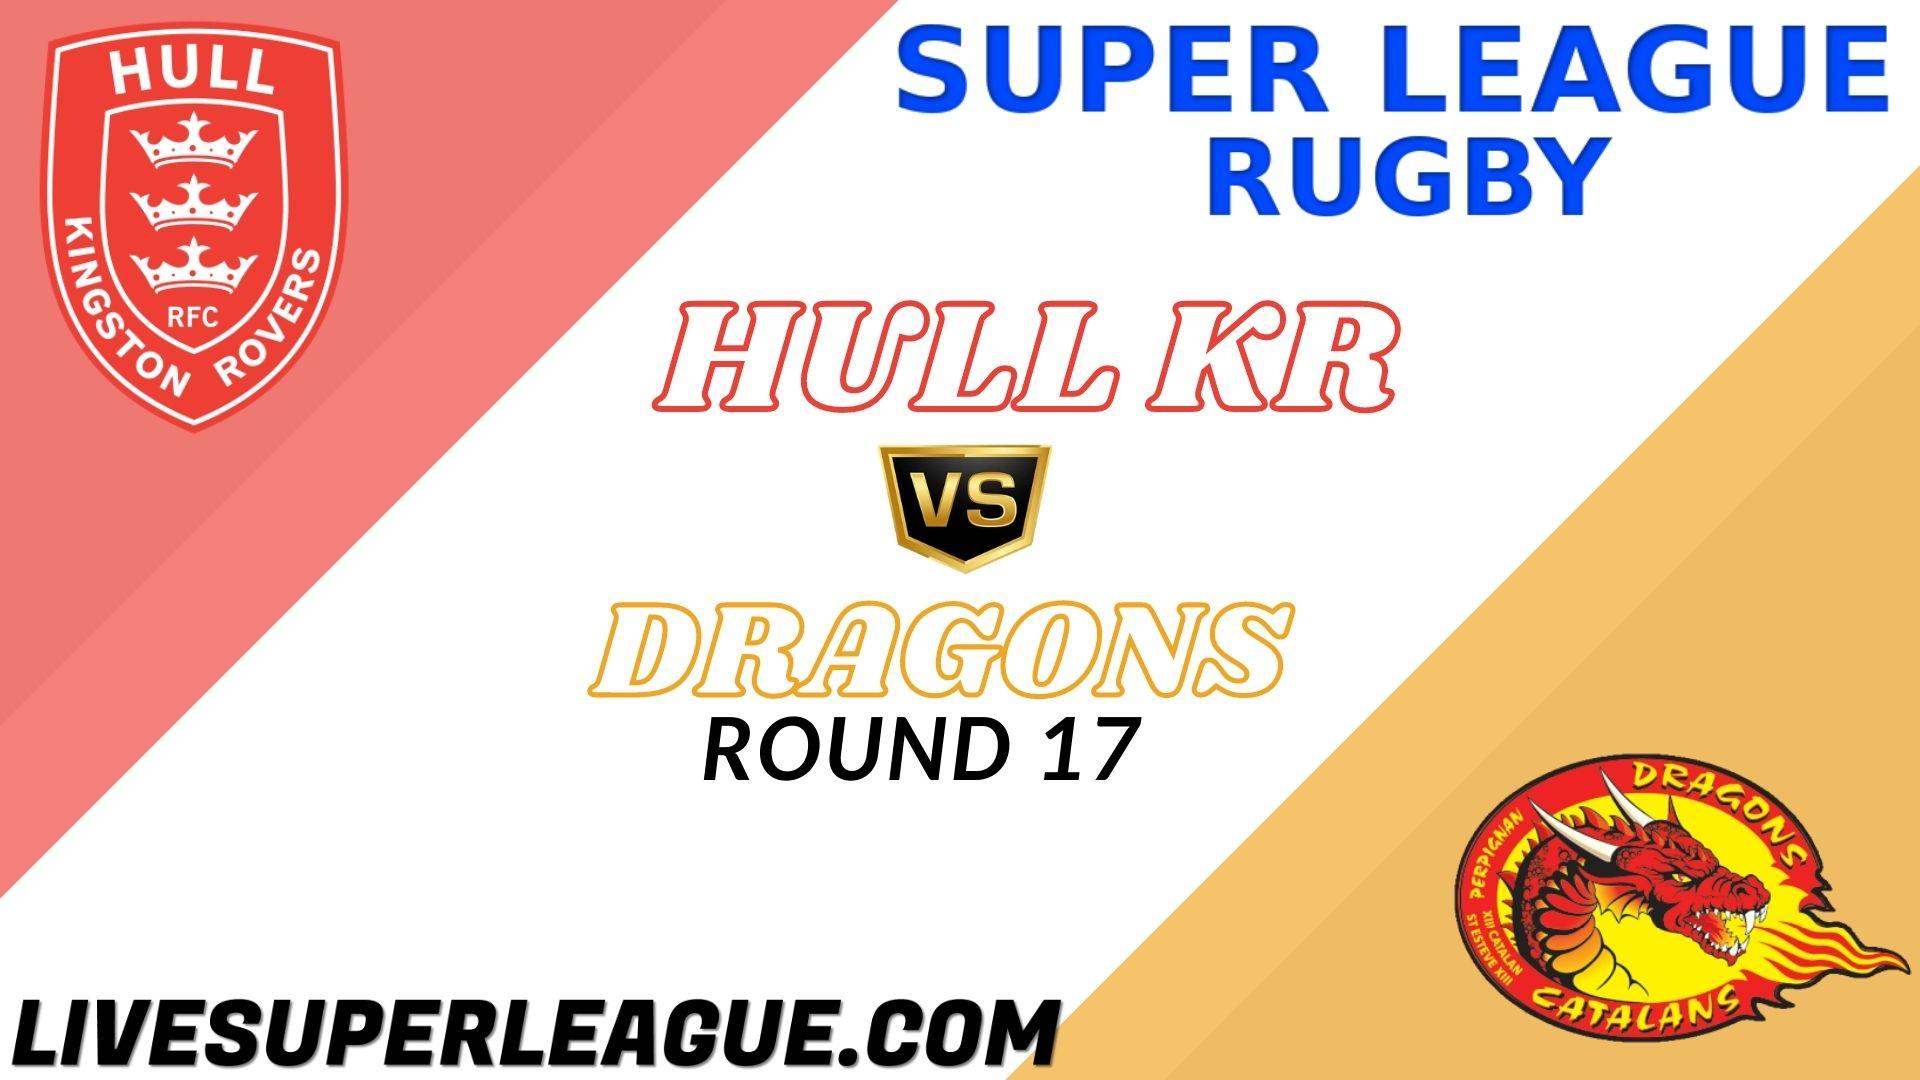 Hull KR Vs Dragons RD 17 Live Stream 2021 | Full Match Replay